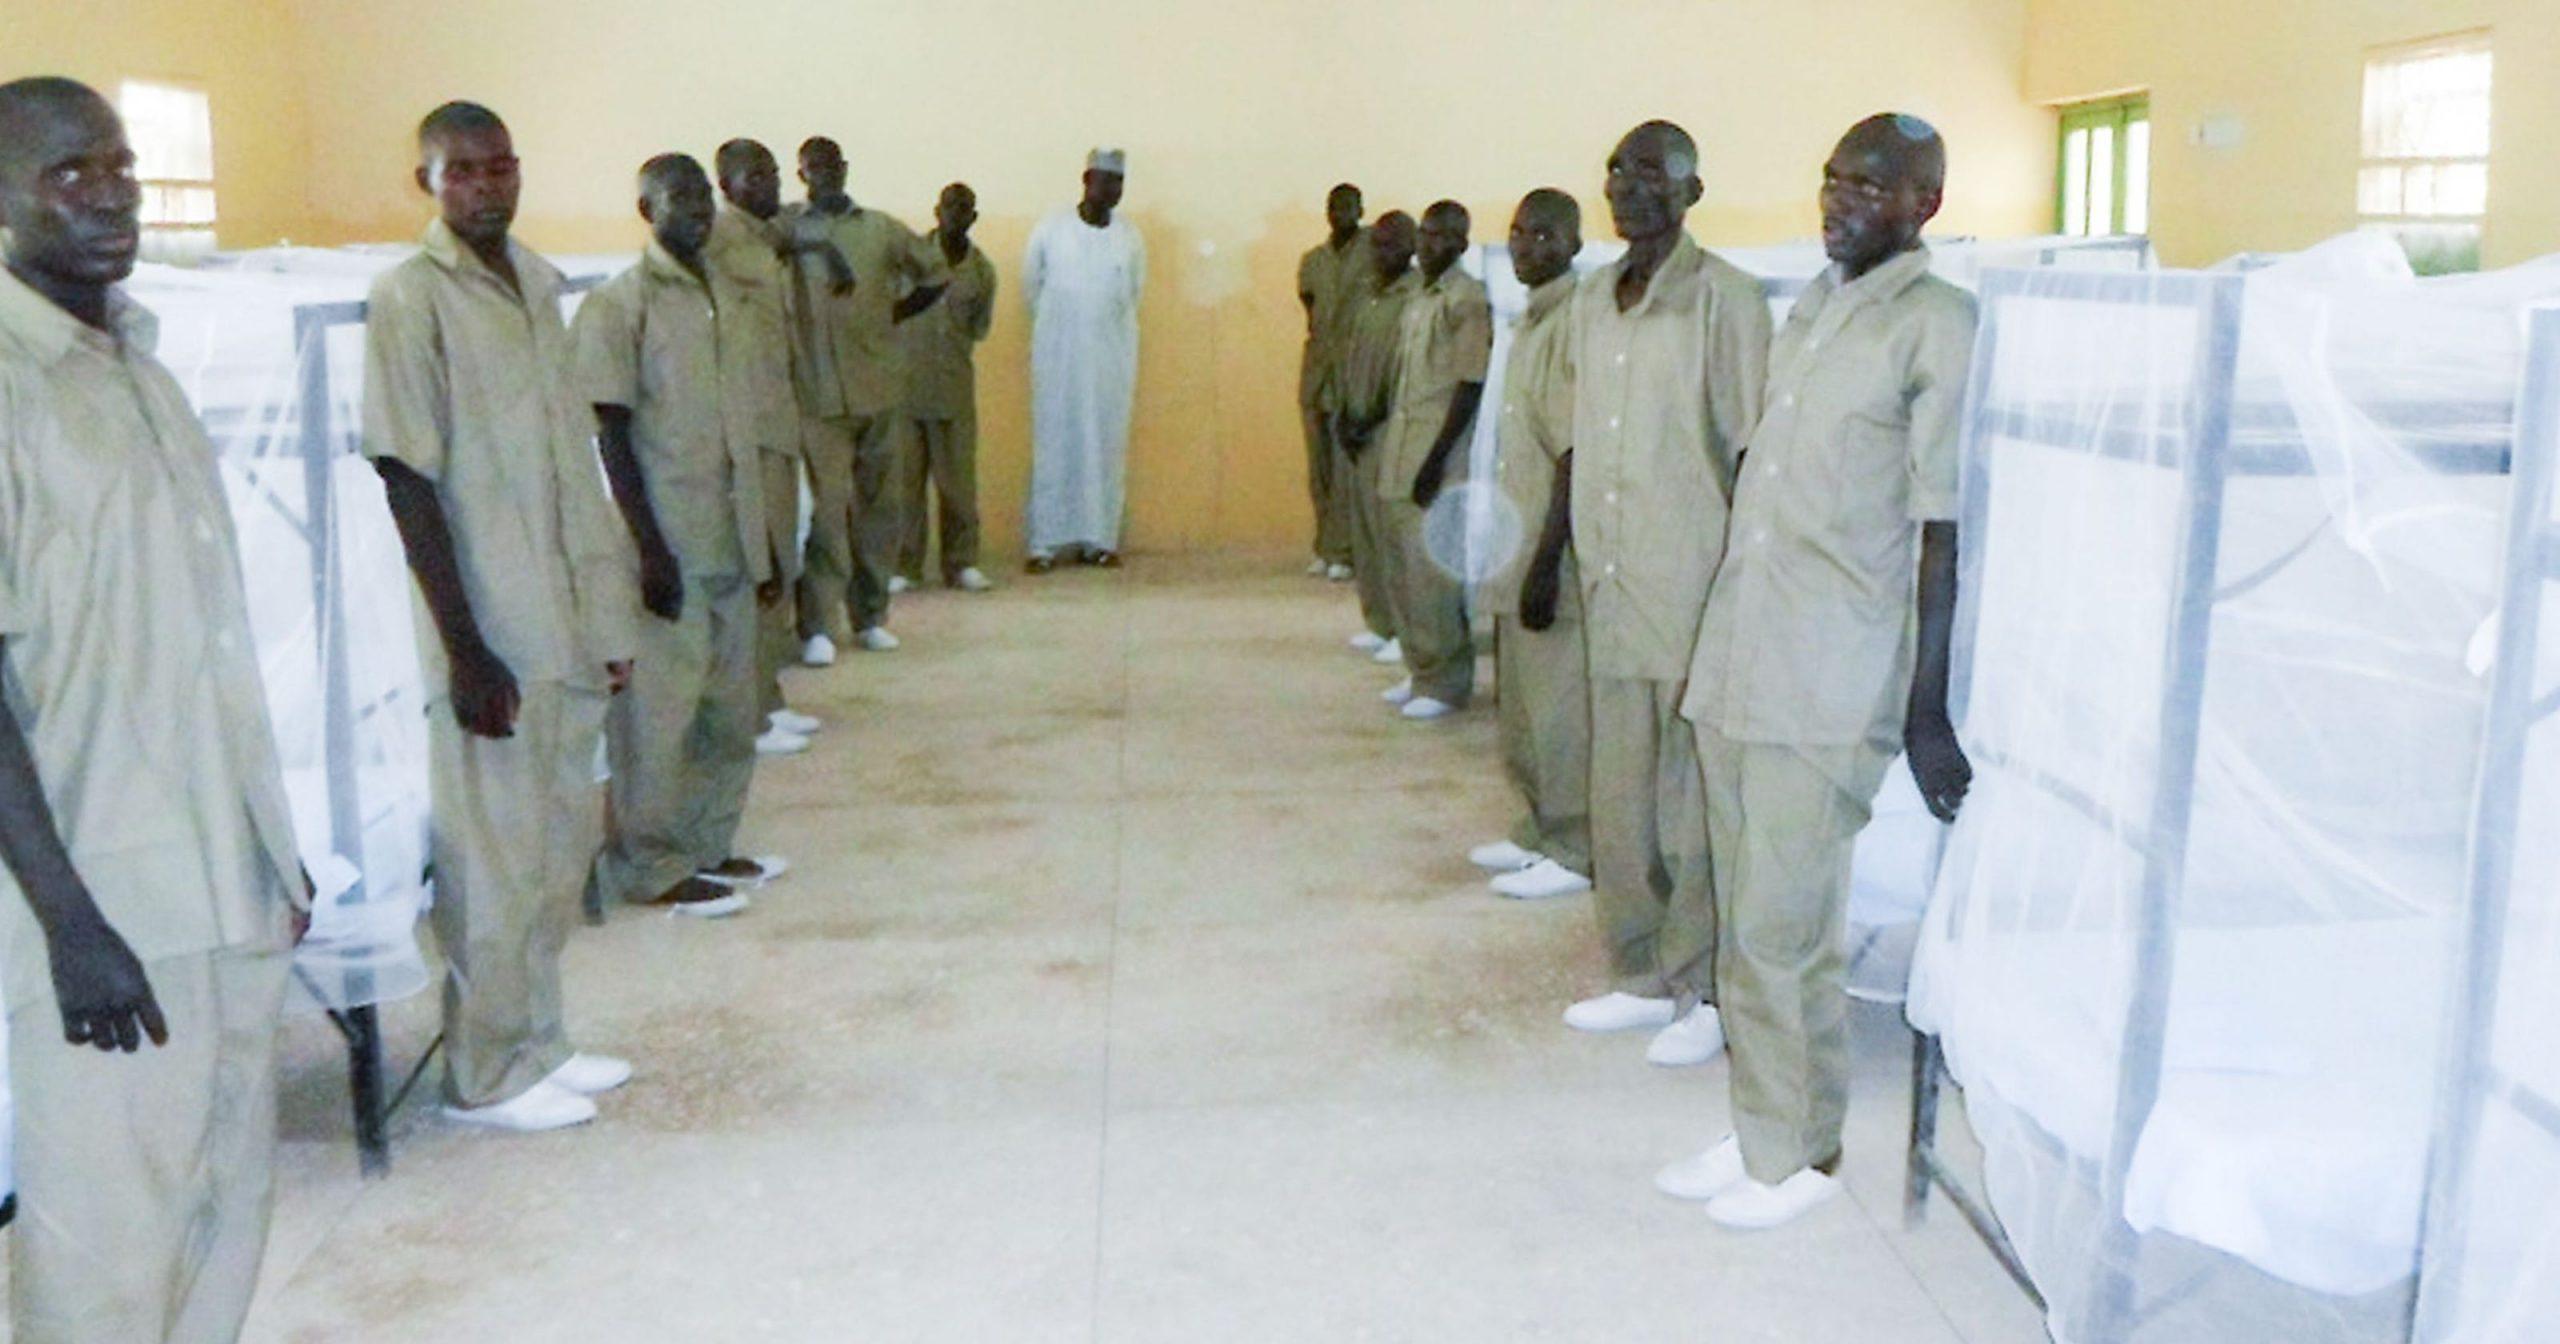 602 repentant Boko Haram swears oath of allegiance to Nigeria